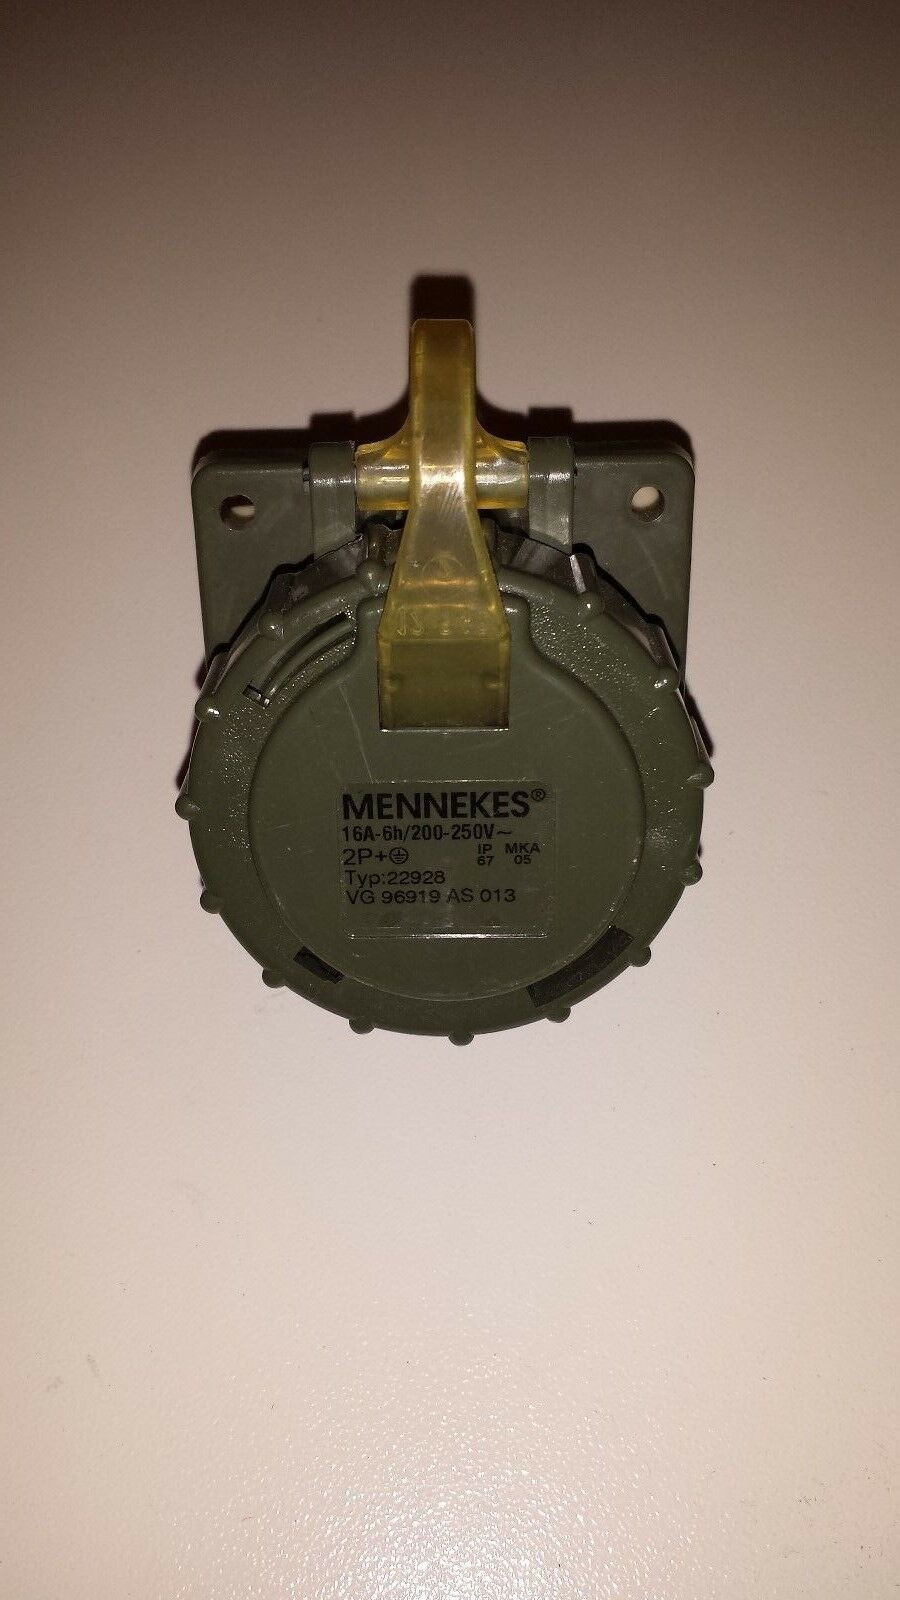 Mennekes 22928 Anbaudose TM 16A 3p 3p 3p 6h 230V IP67 mit Dichtung | Qualitätskönigin  8fbed3